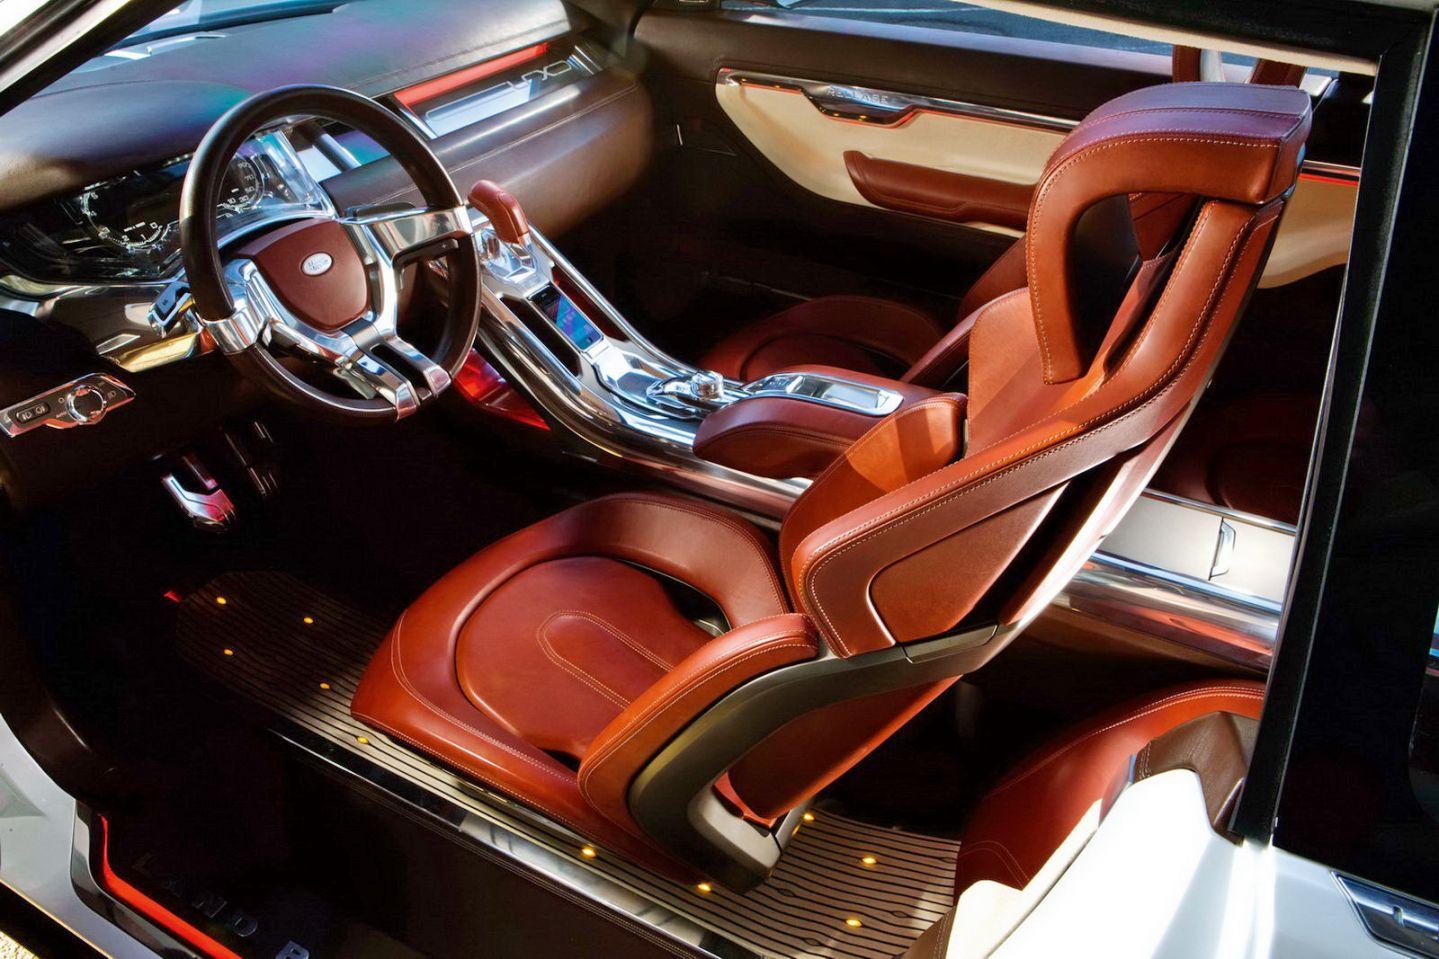 2012 land range rover evoque revealed new car used car reviews picture. Black Bedroom Furniture Sets. Home Design Ideas